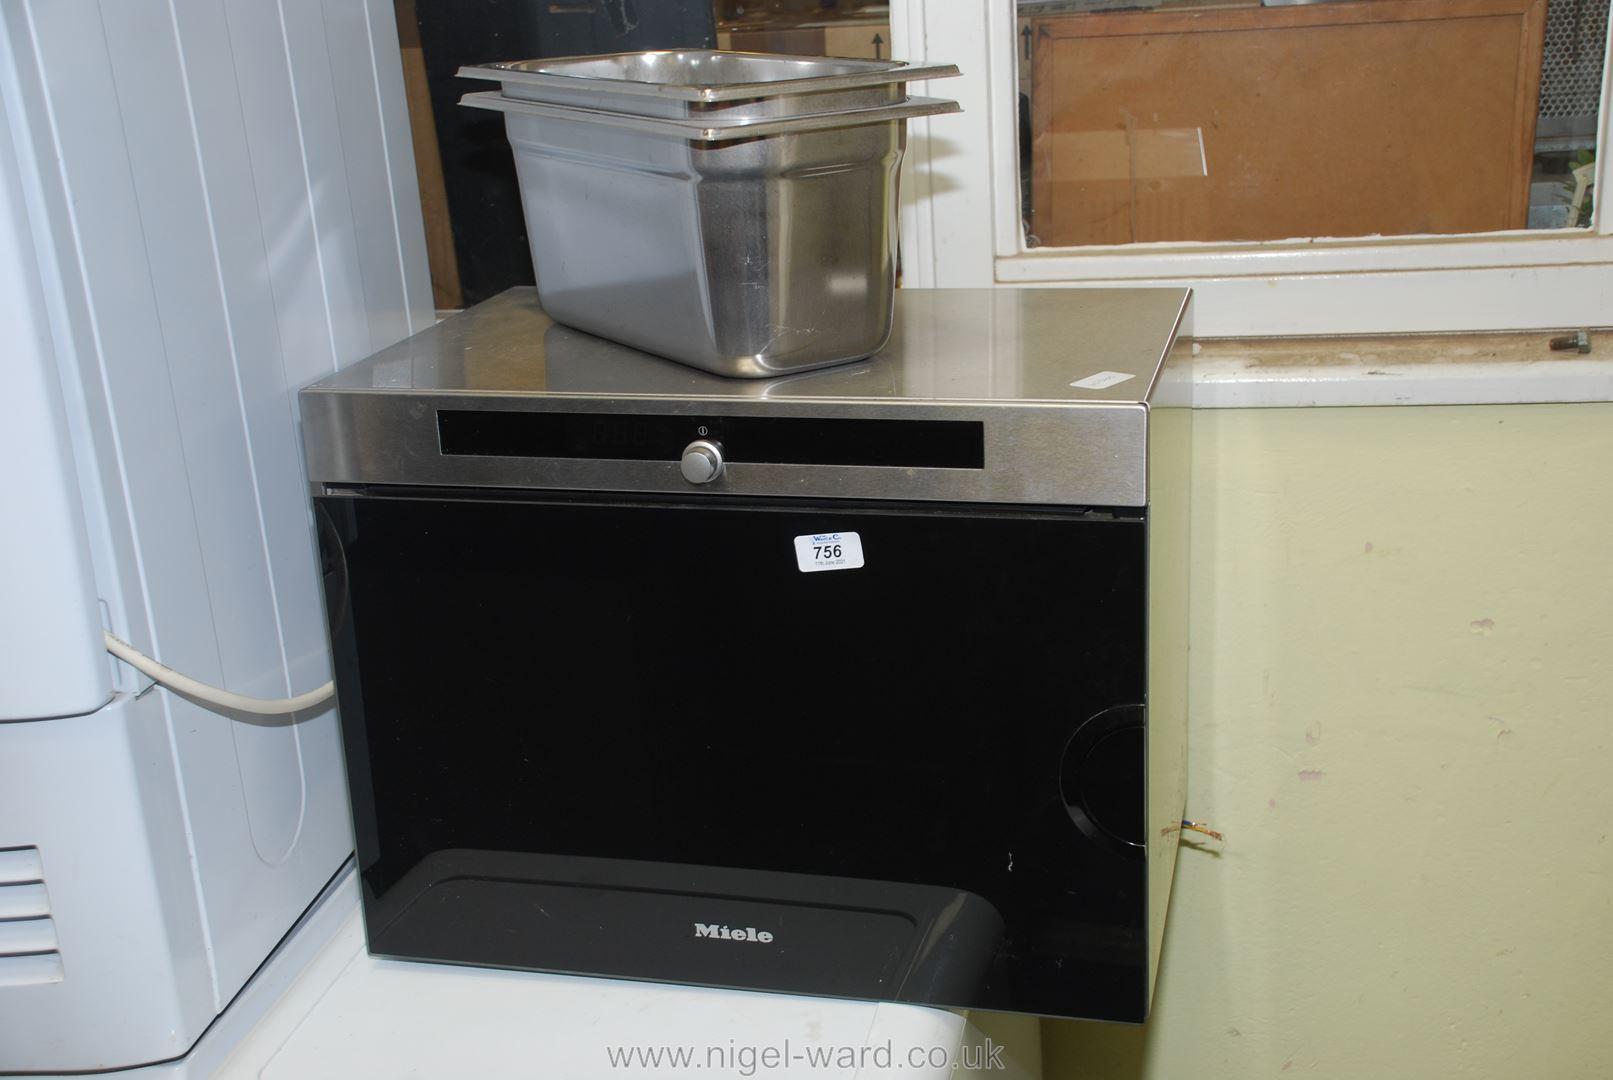 A Miele steam oven.